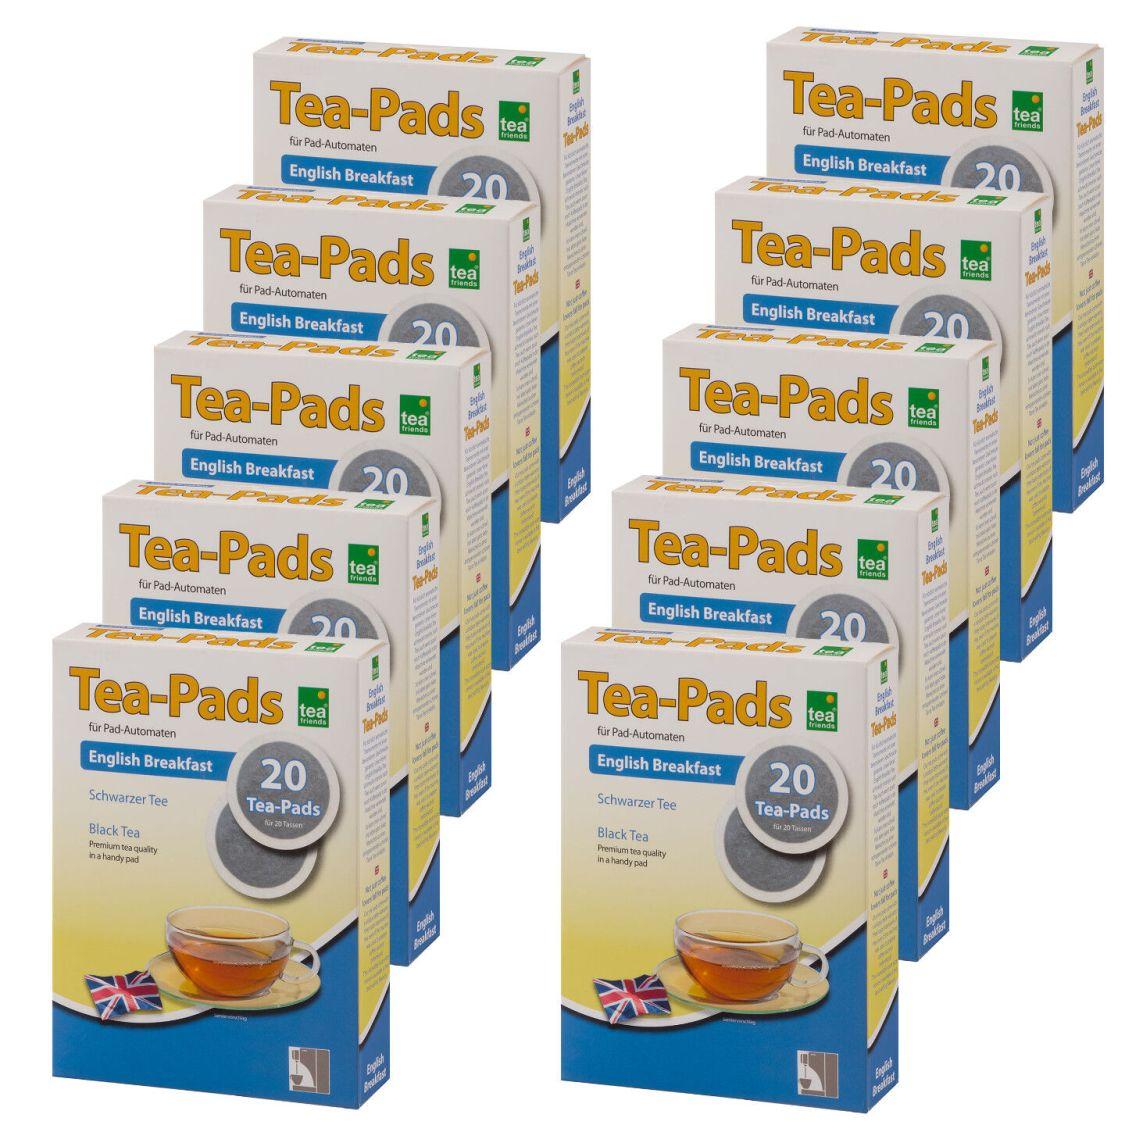 200 Tee Pads (10Pkg)  -ENGLISH BREAKFAST- Tea-Pad  Tea-Friends - Senseo geeignet